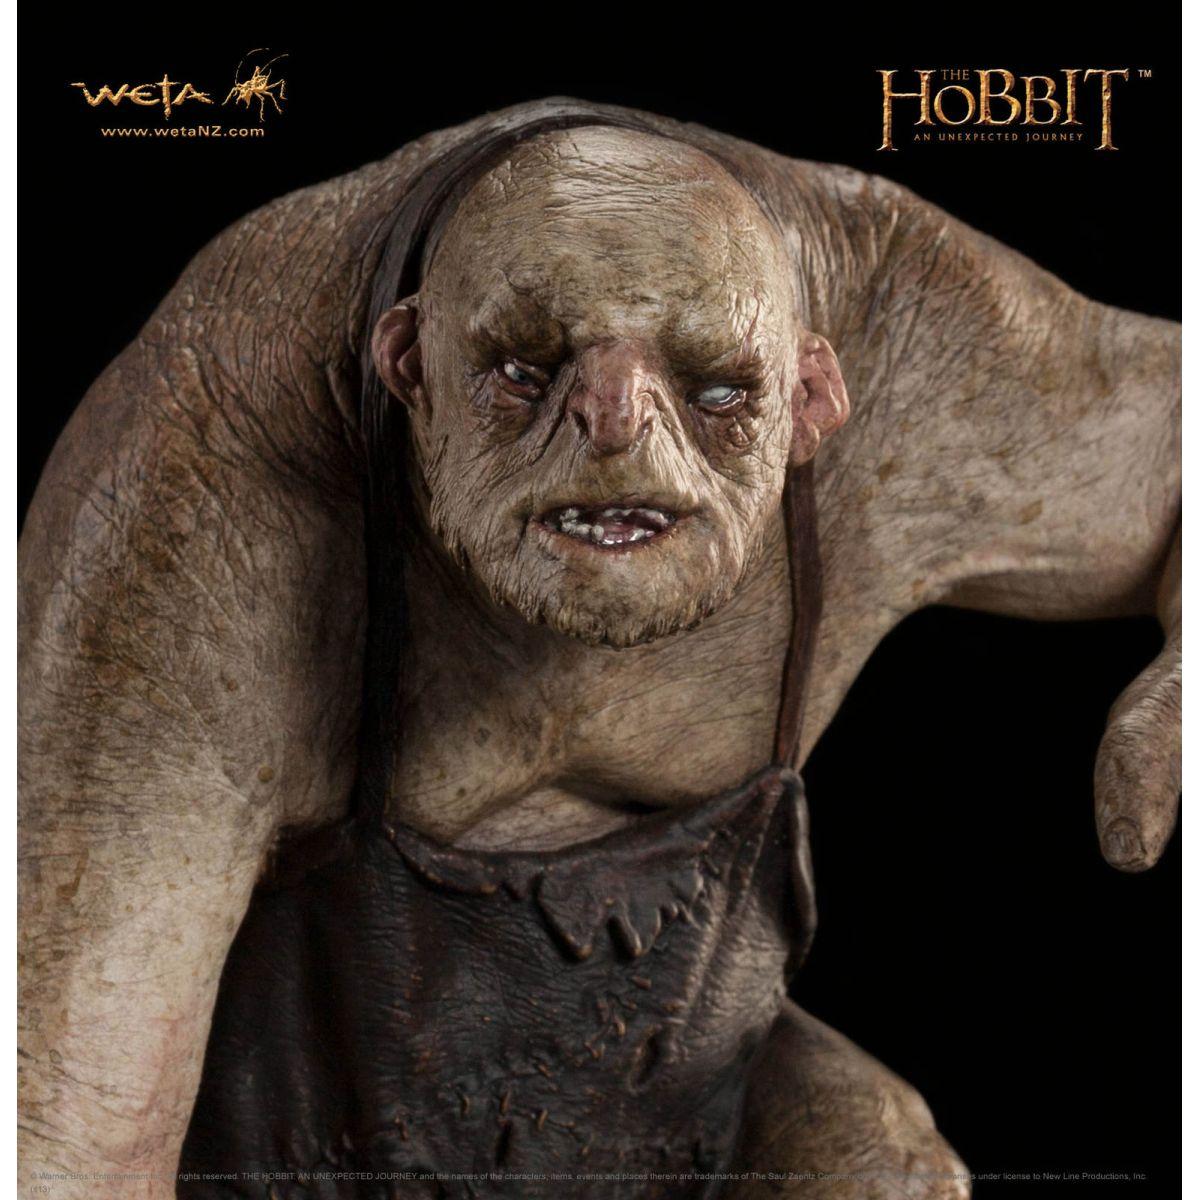 Estátua Bert the Troll: O Hobbit: Uma Jornada Inesperada - Weta - CD